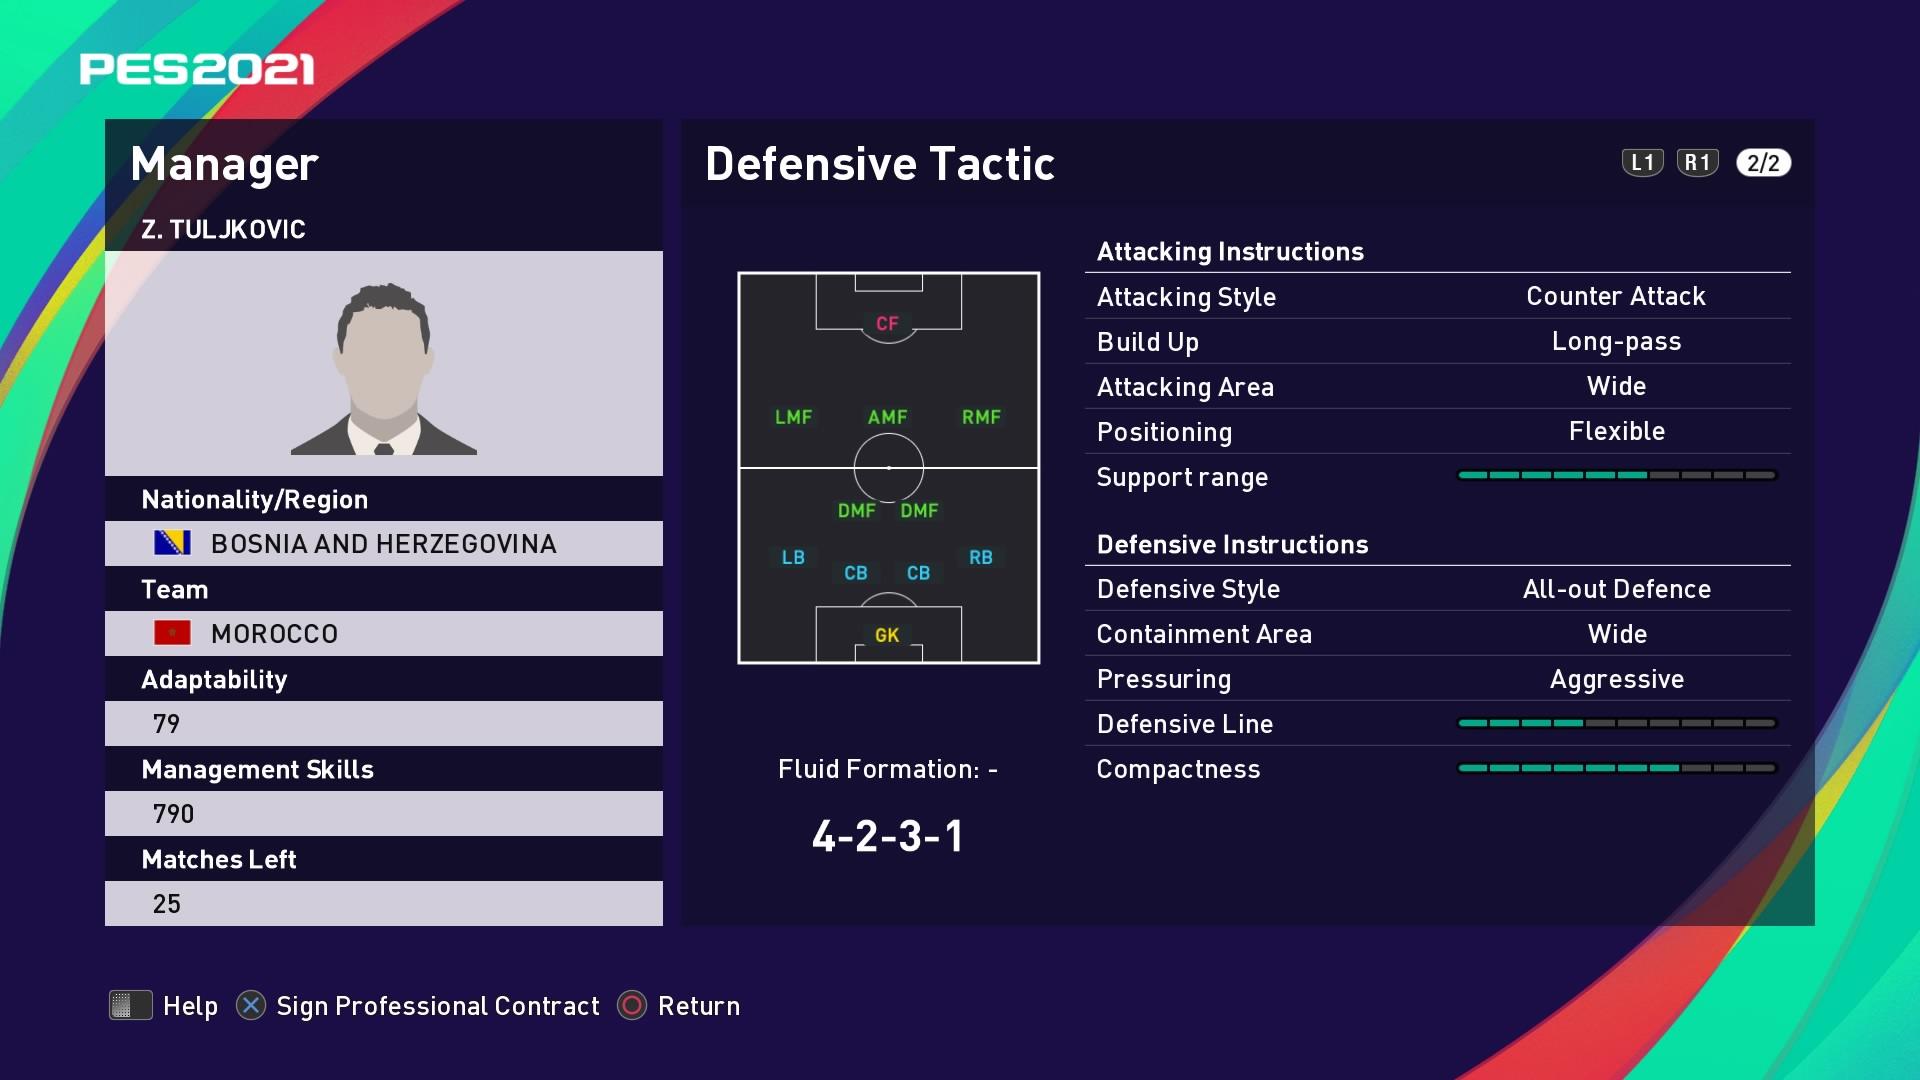 Z. Tuljkovic (Vahid Halilhodžić) Defensive Tactic in PES 2021 myClub